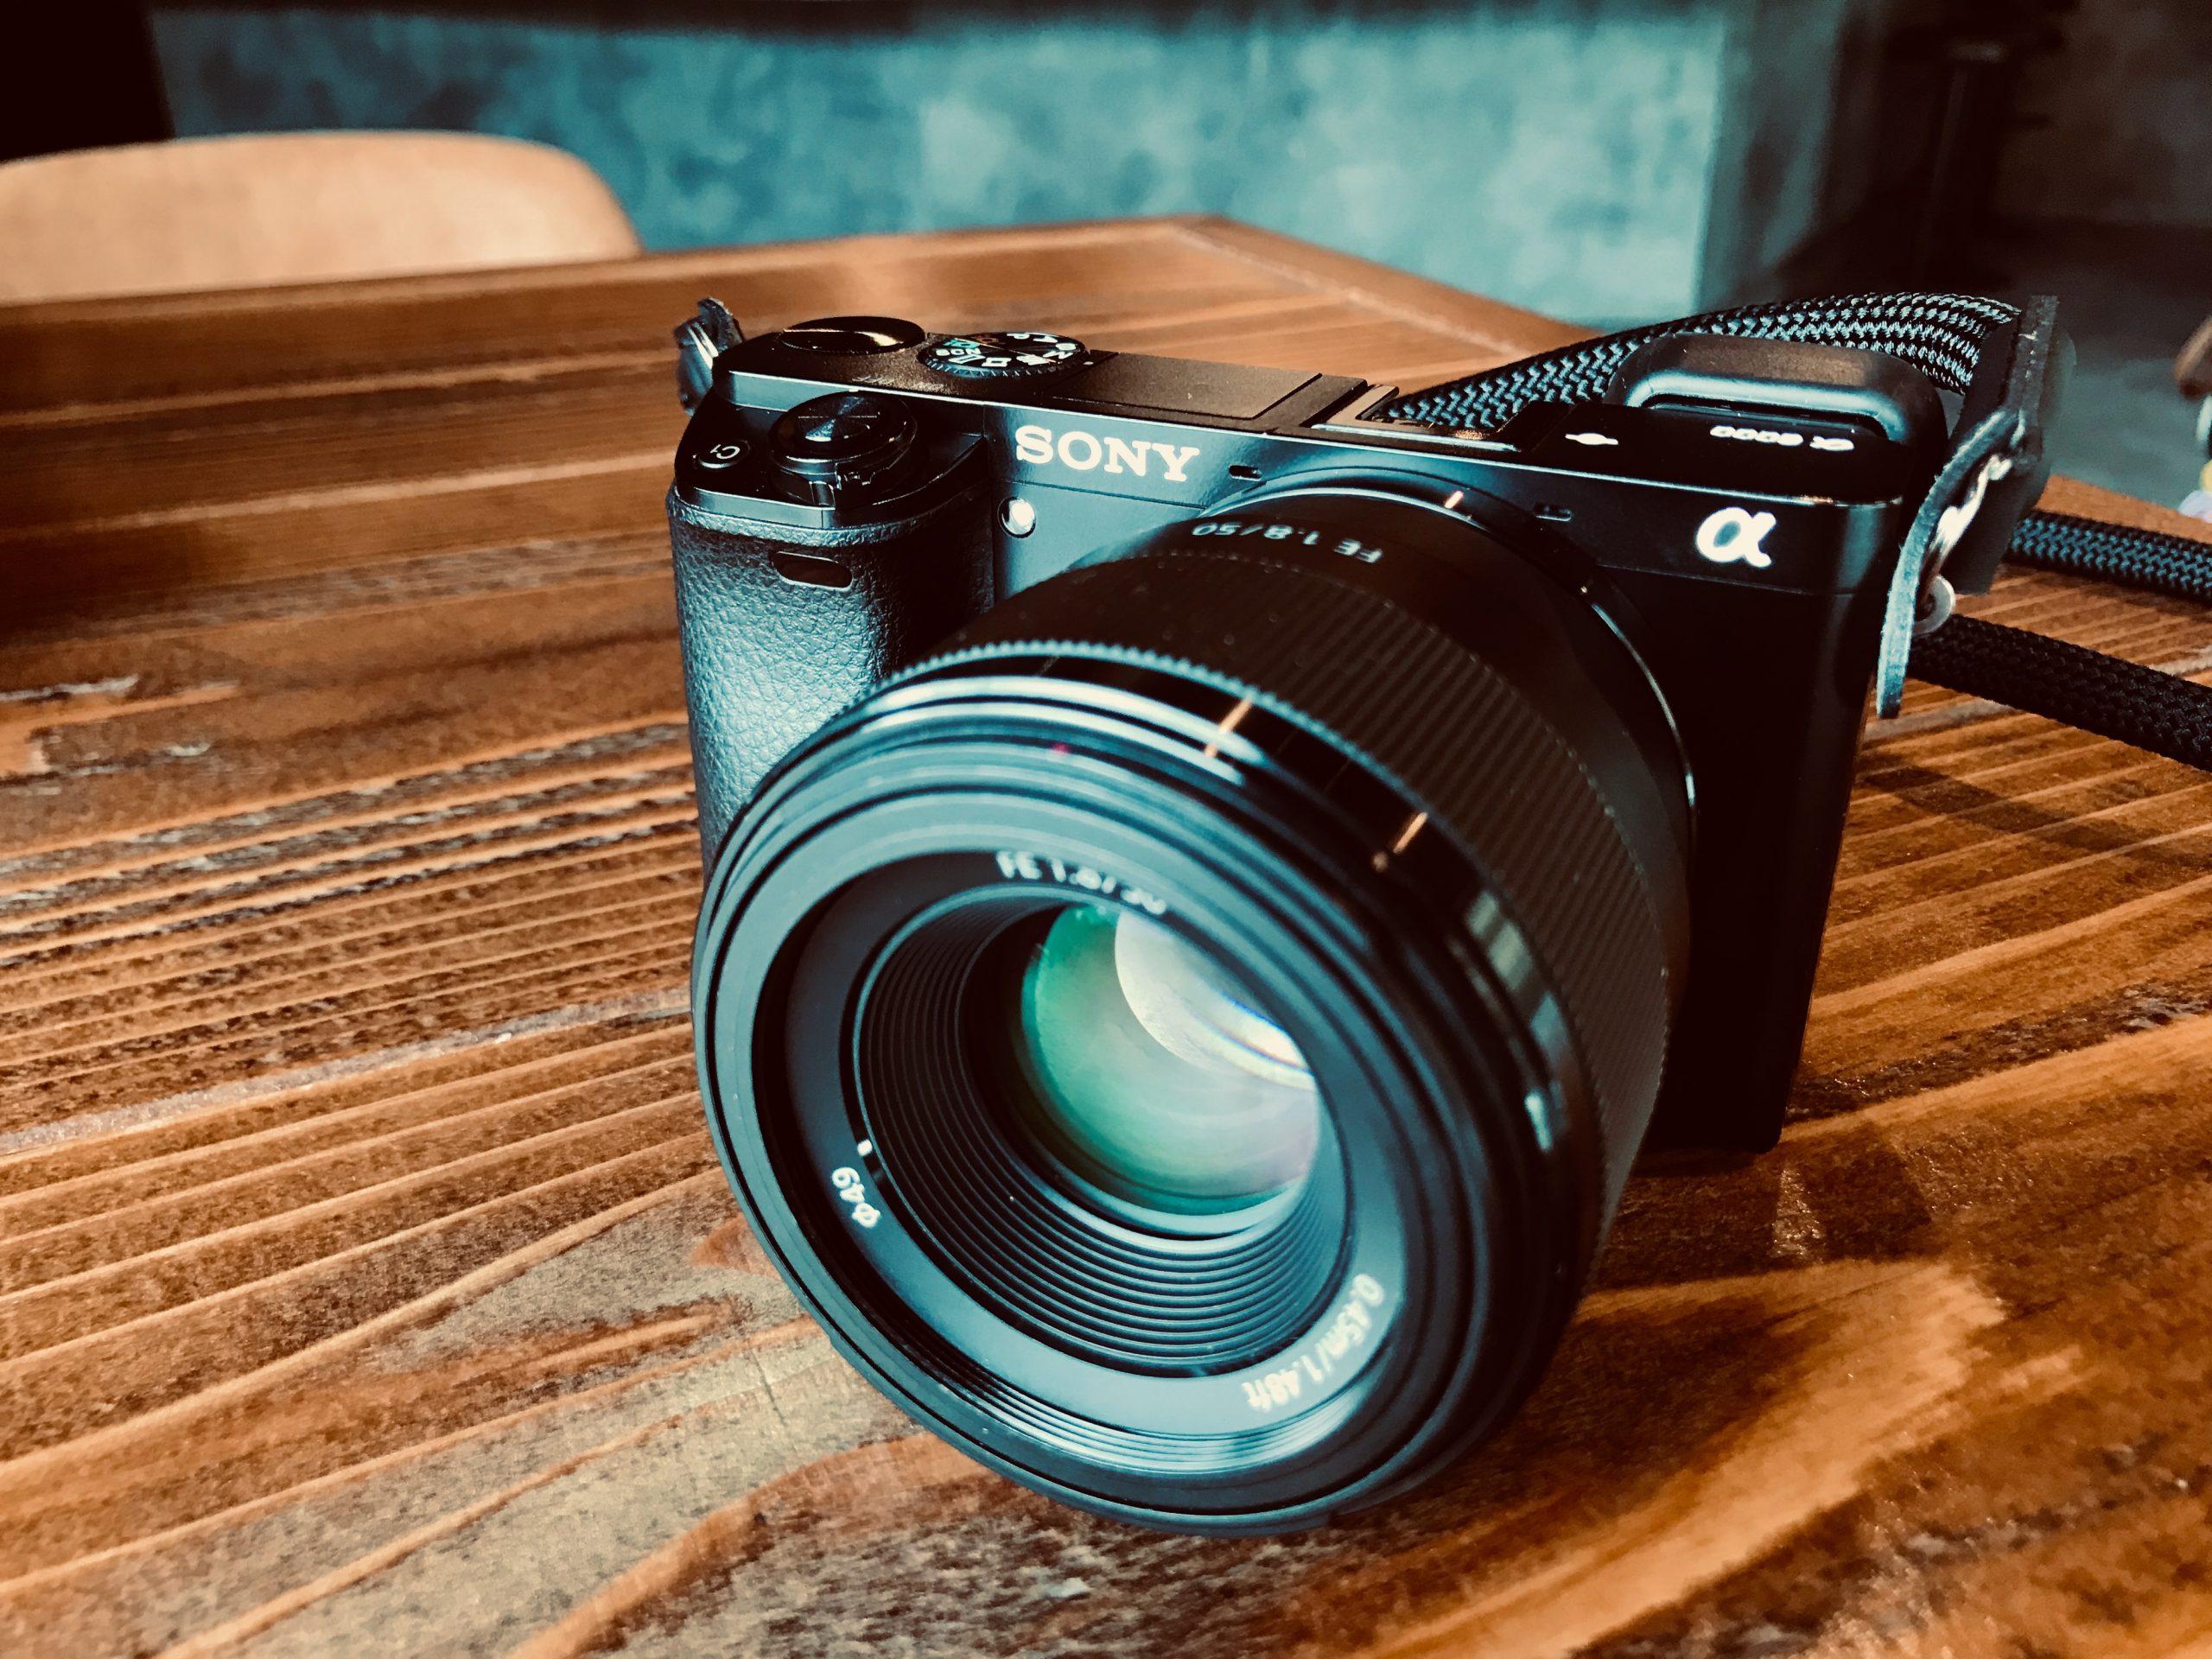 【SONY】カメラを始める時、α6000がおすすめな理由。